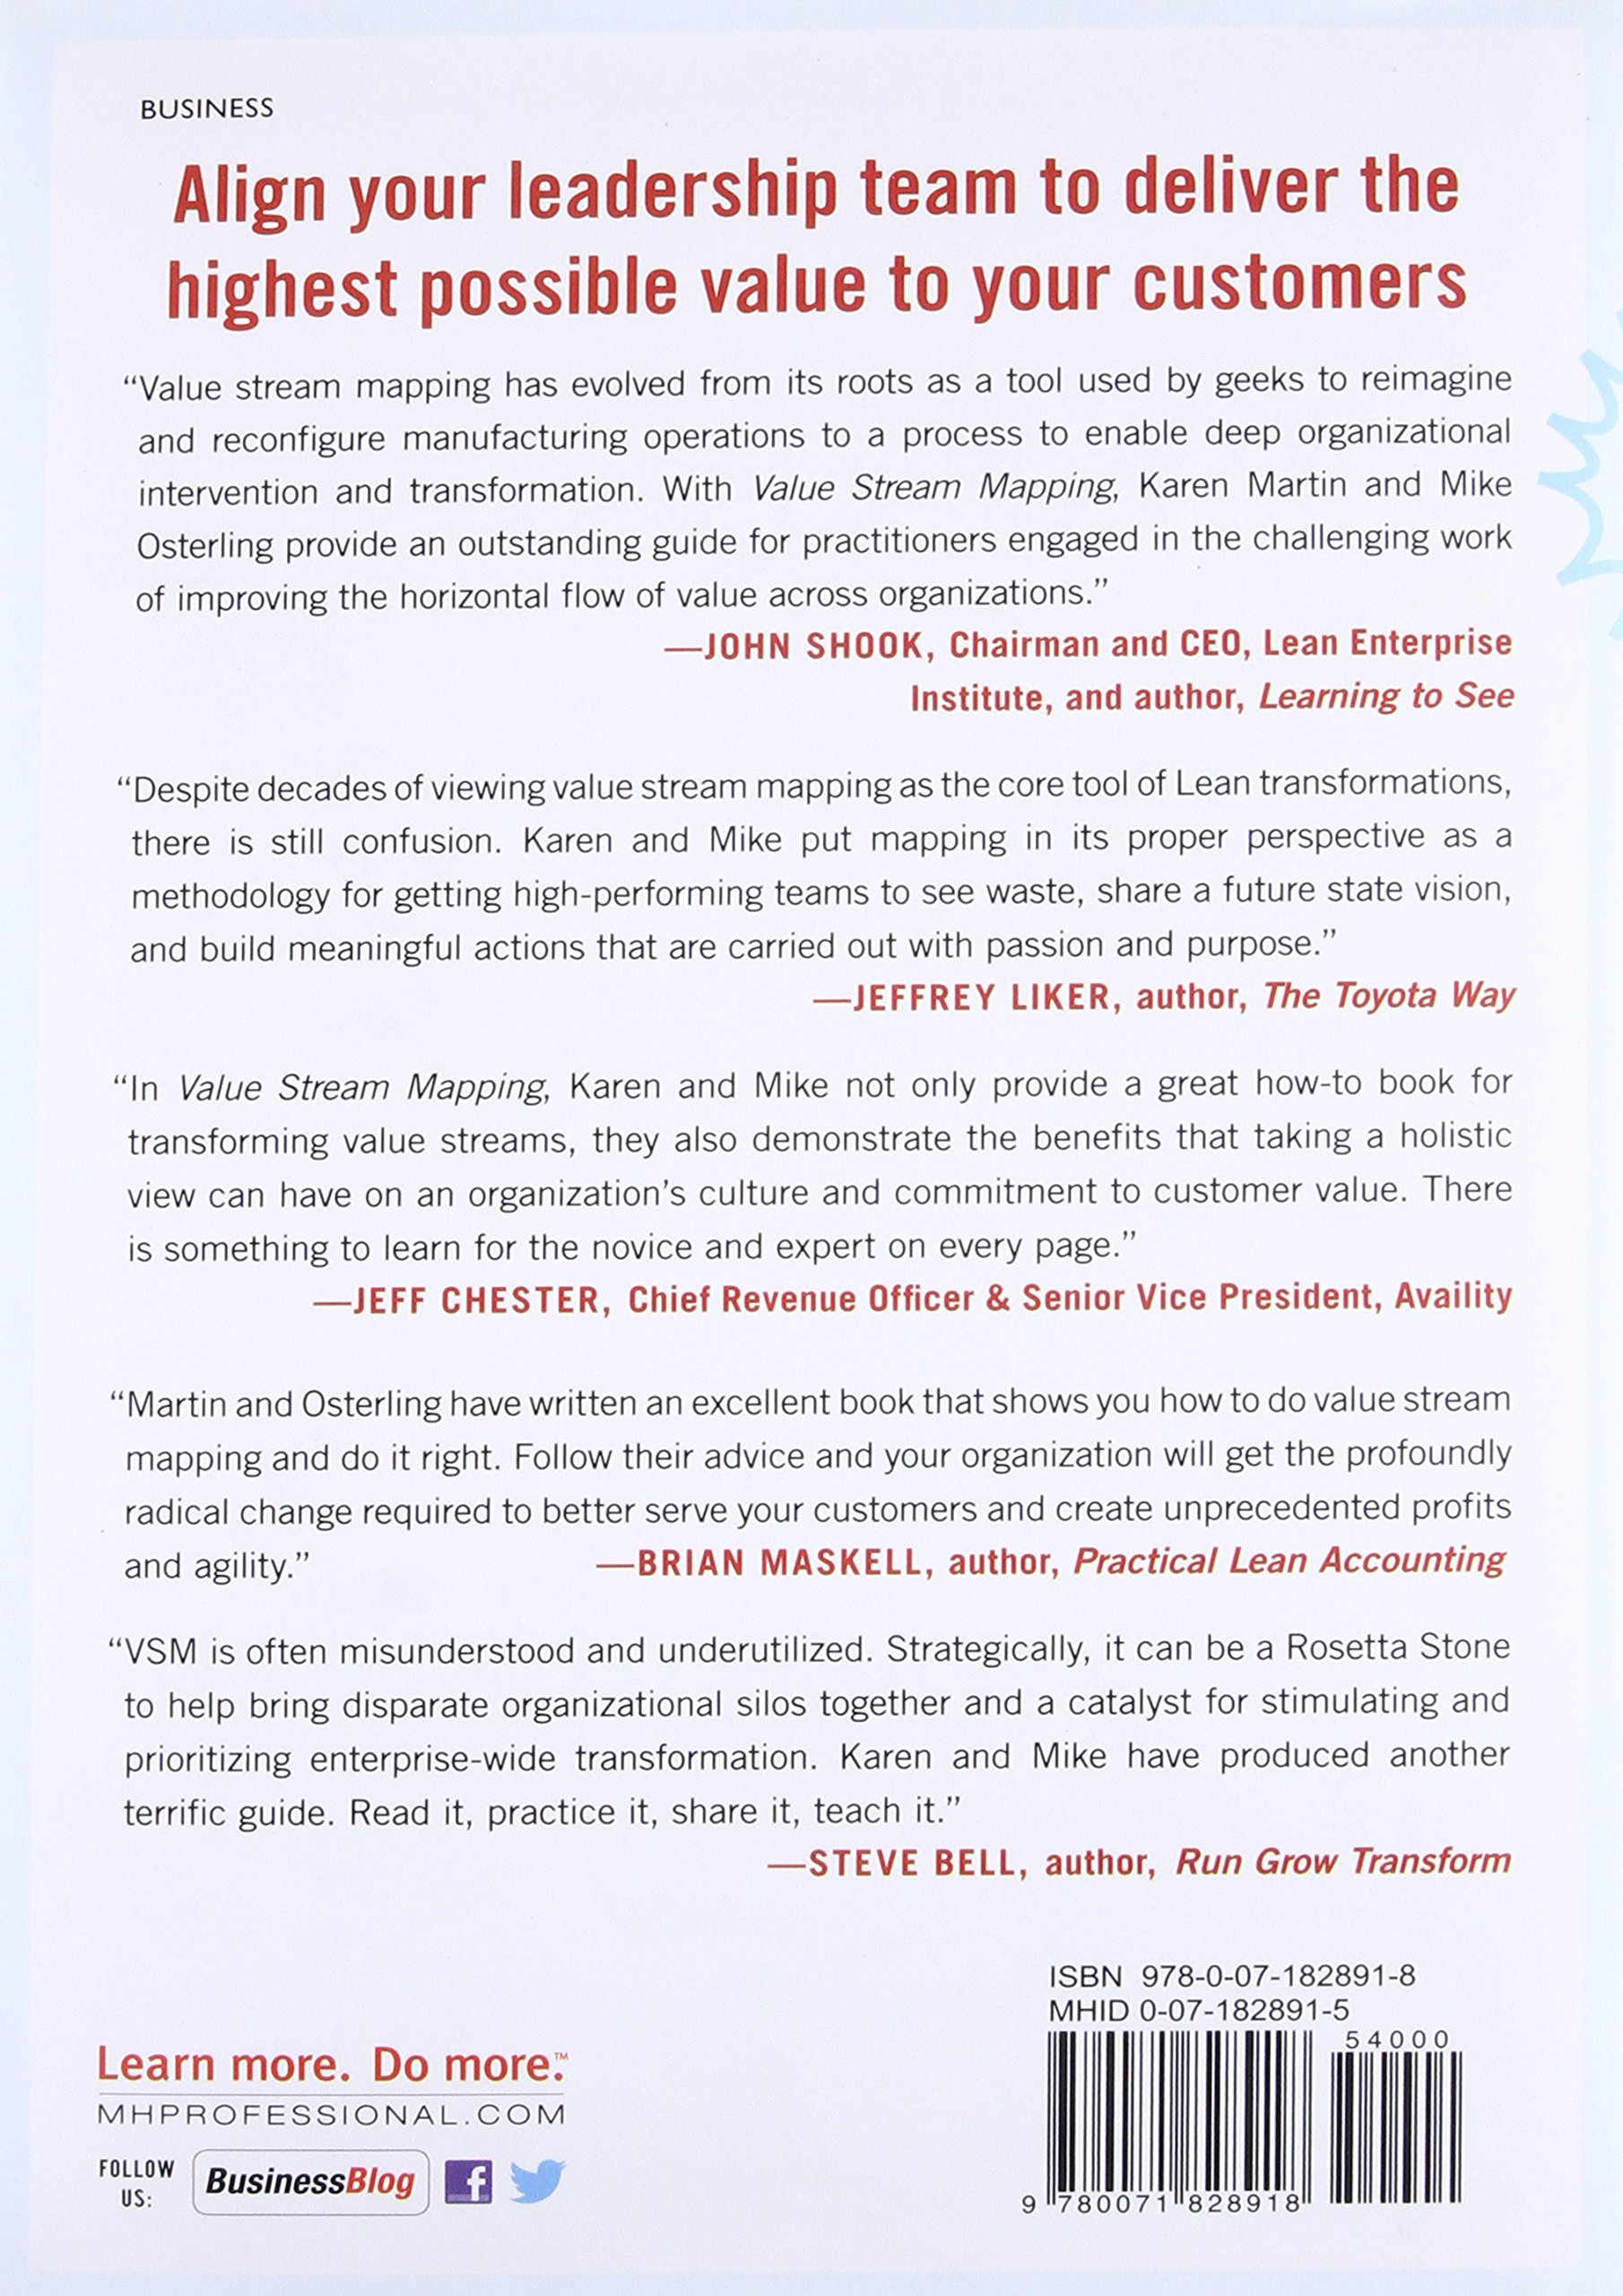 an introduction to the amazoncom [0d4045] - introduction to analysis solution manual amazoncom solutions manual for introduction to genetic analysis 9781464187940 anthony jf griffiths susan r wessler richard c lewontin sean.